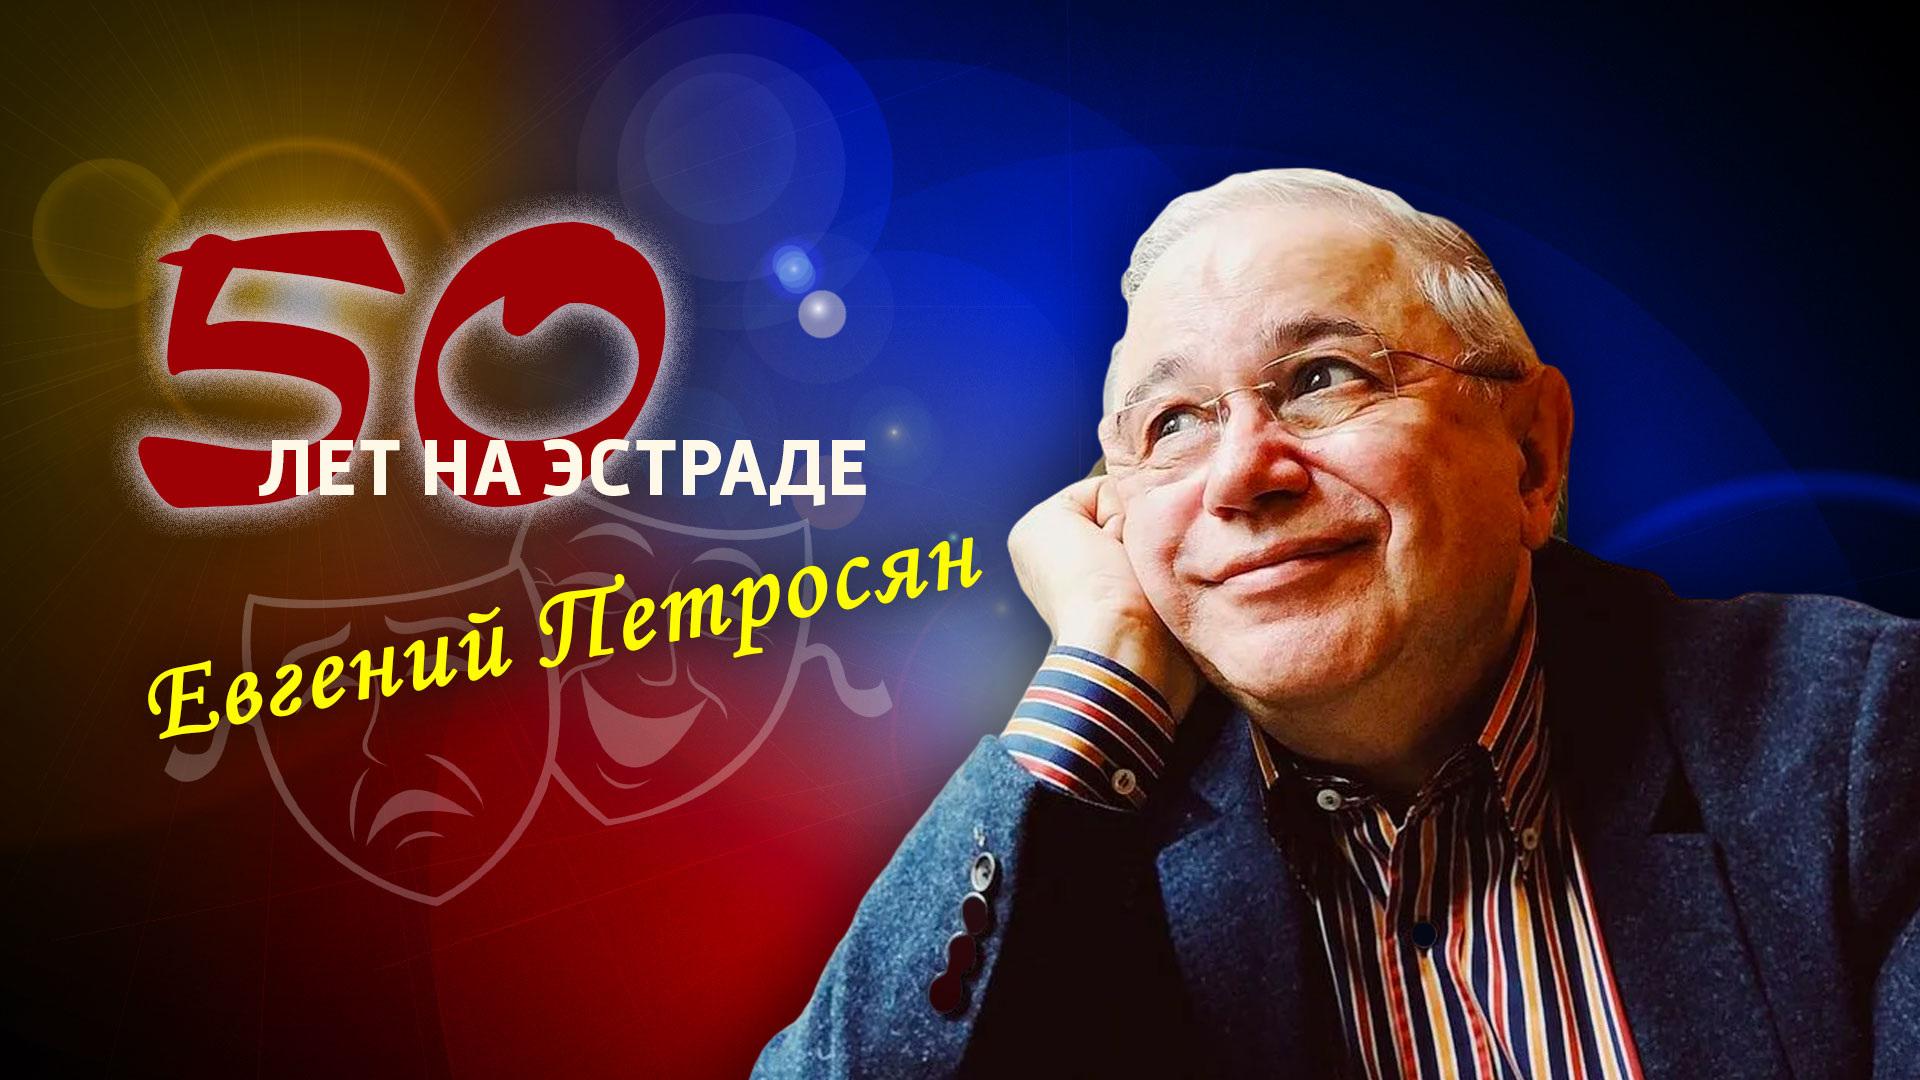 Евгений Петросян. 50 лет на эстраде